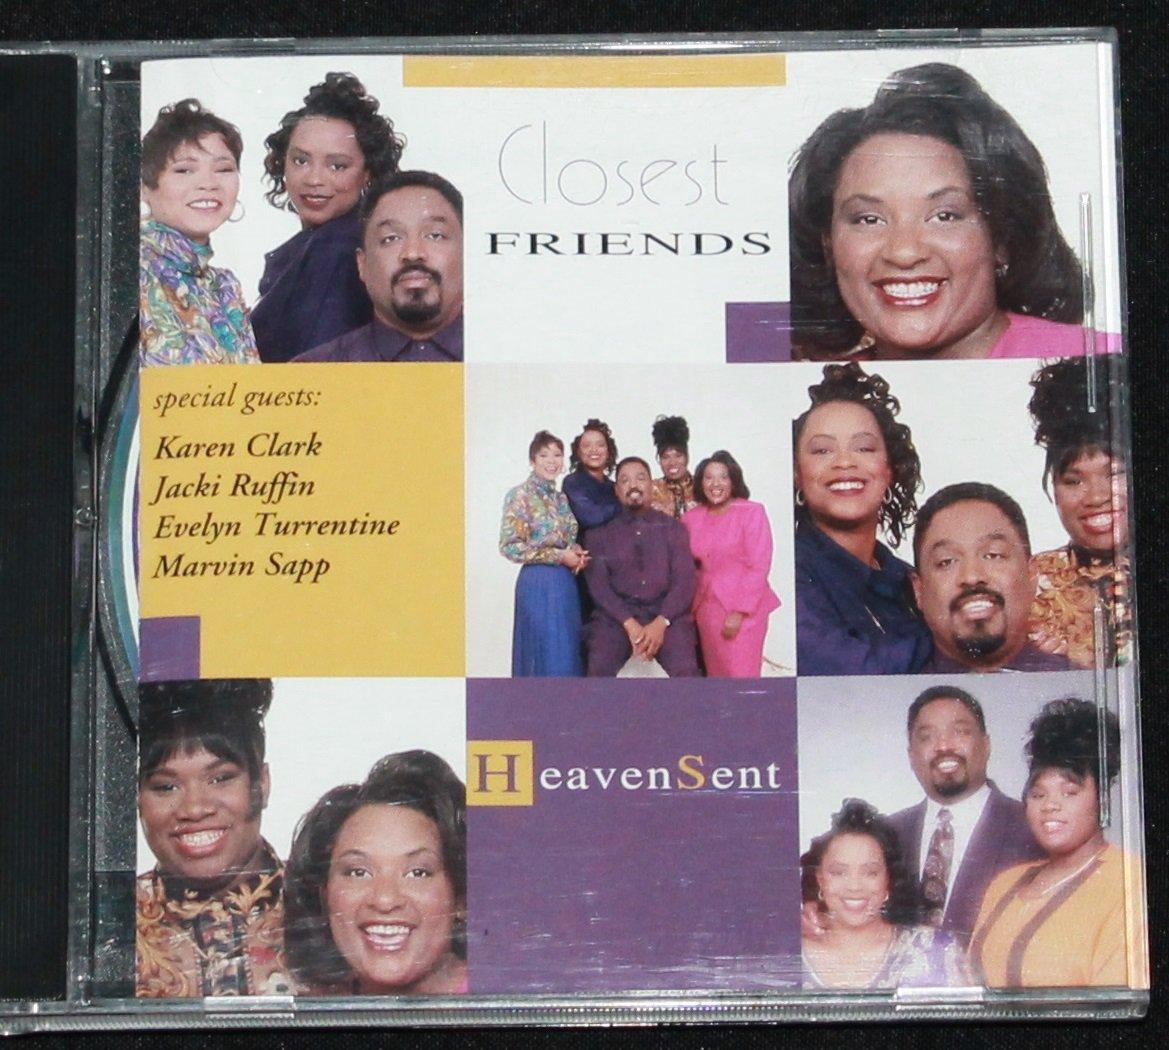 Heavensent CD - Closest Friends album - contemporary Christian gospel pop music heaven sent cd